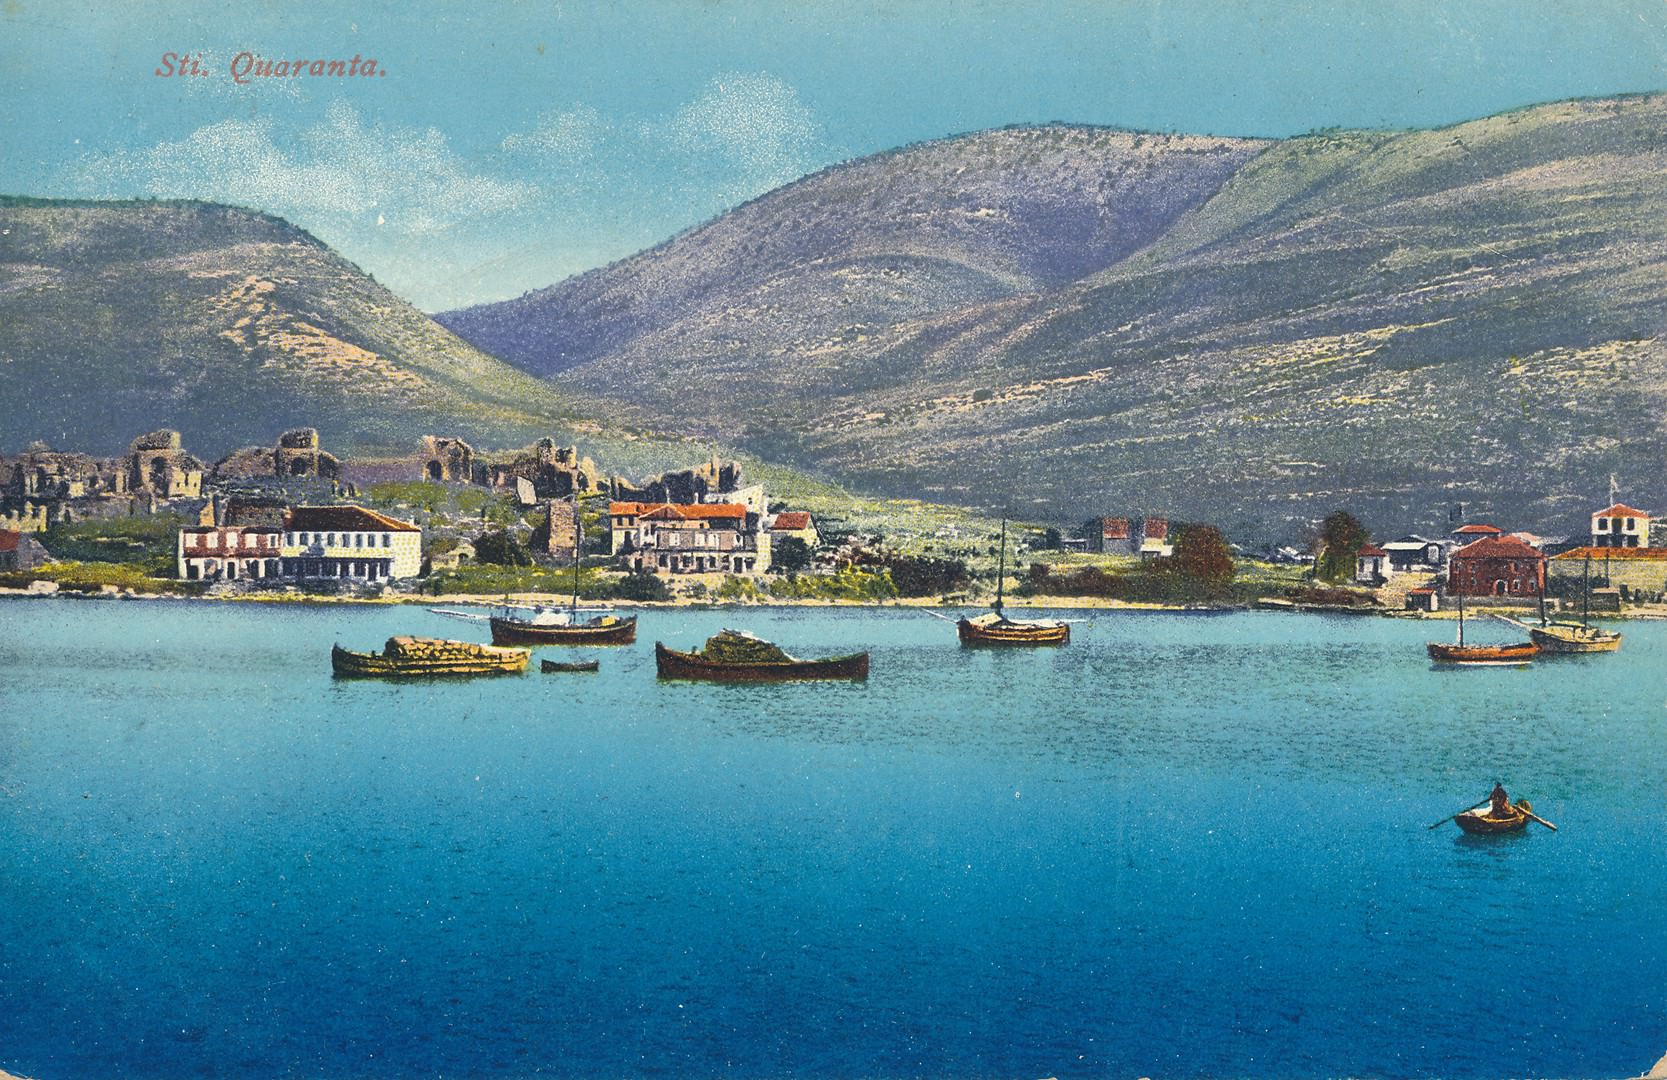 postcard of Saranda